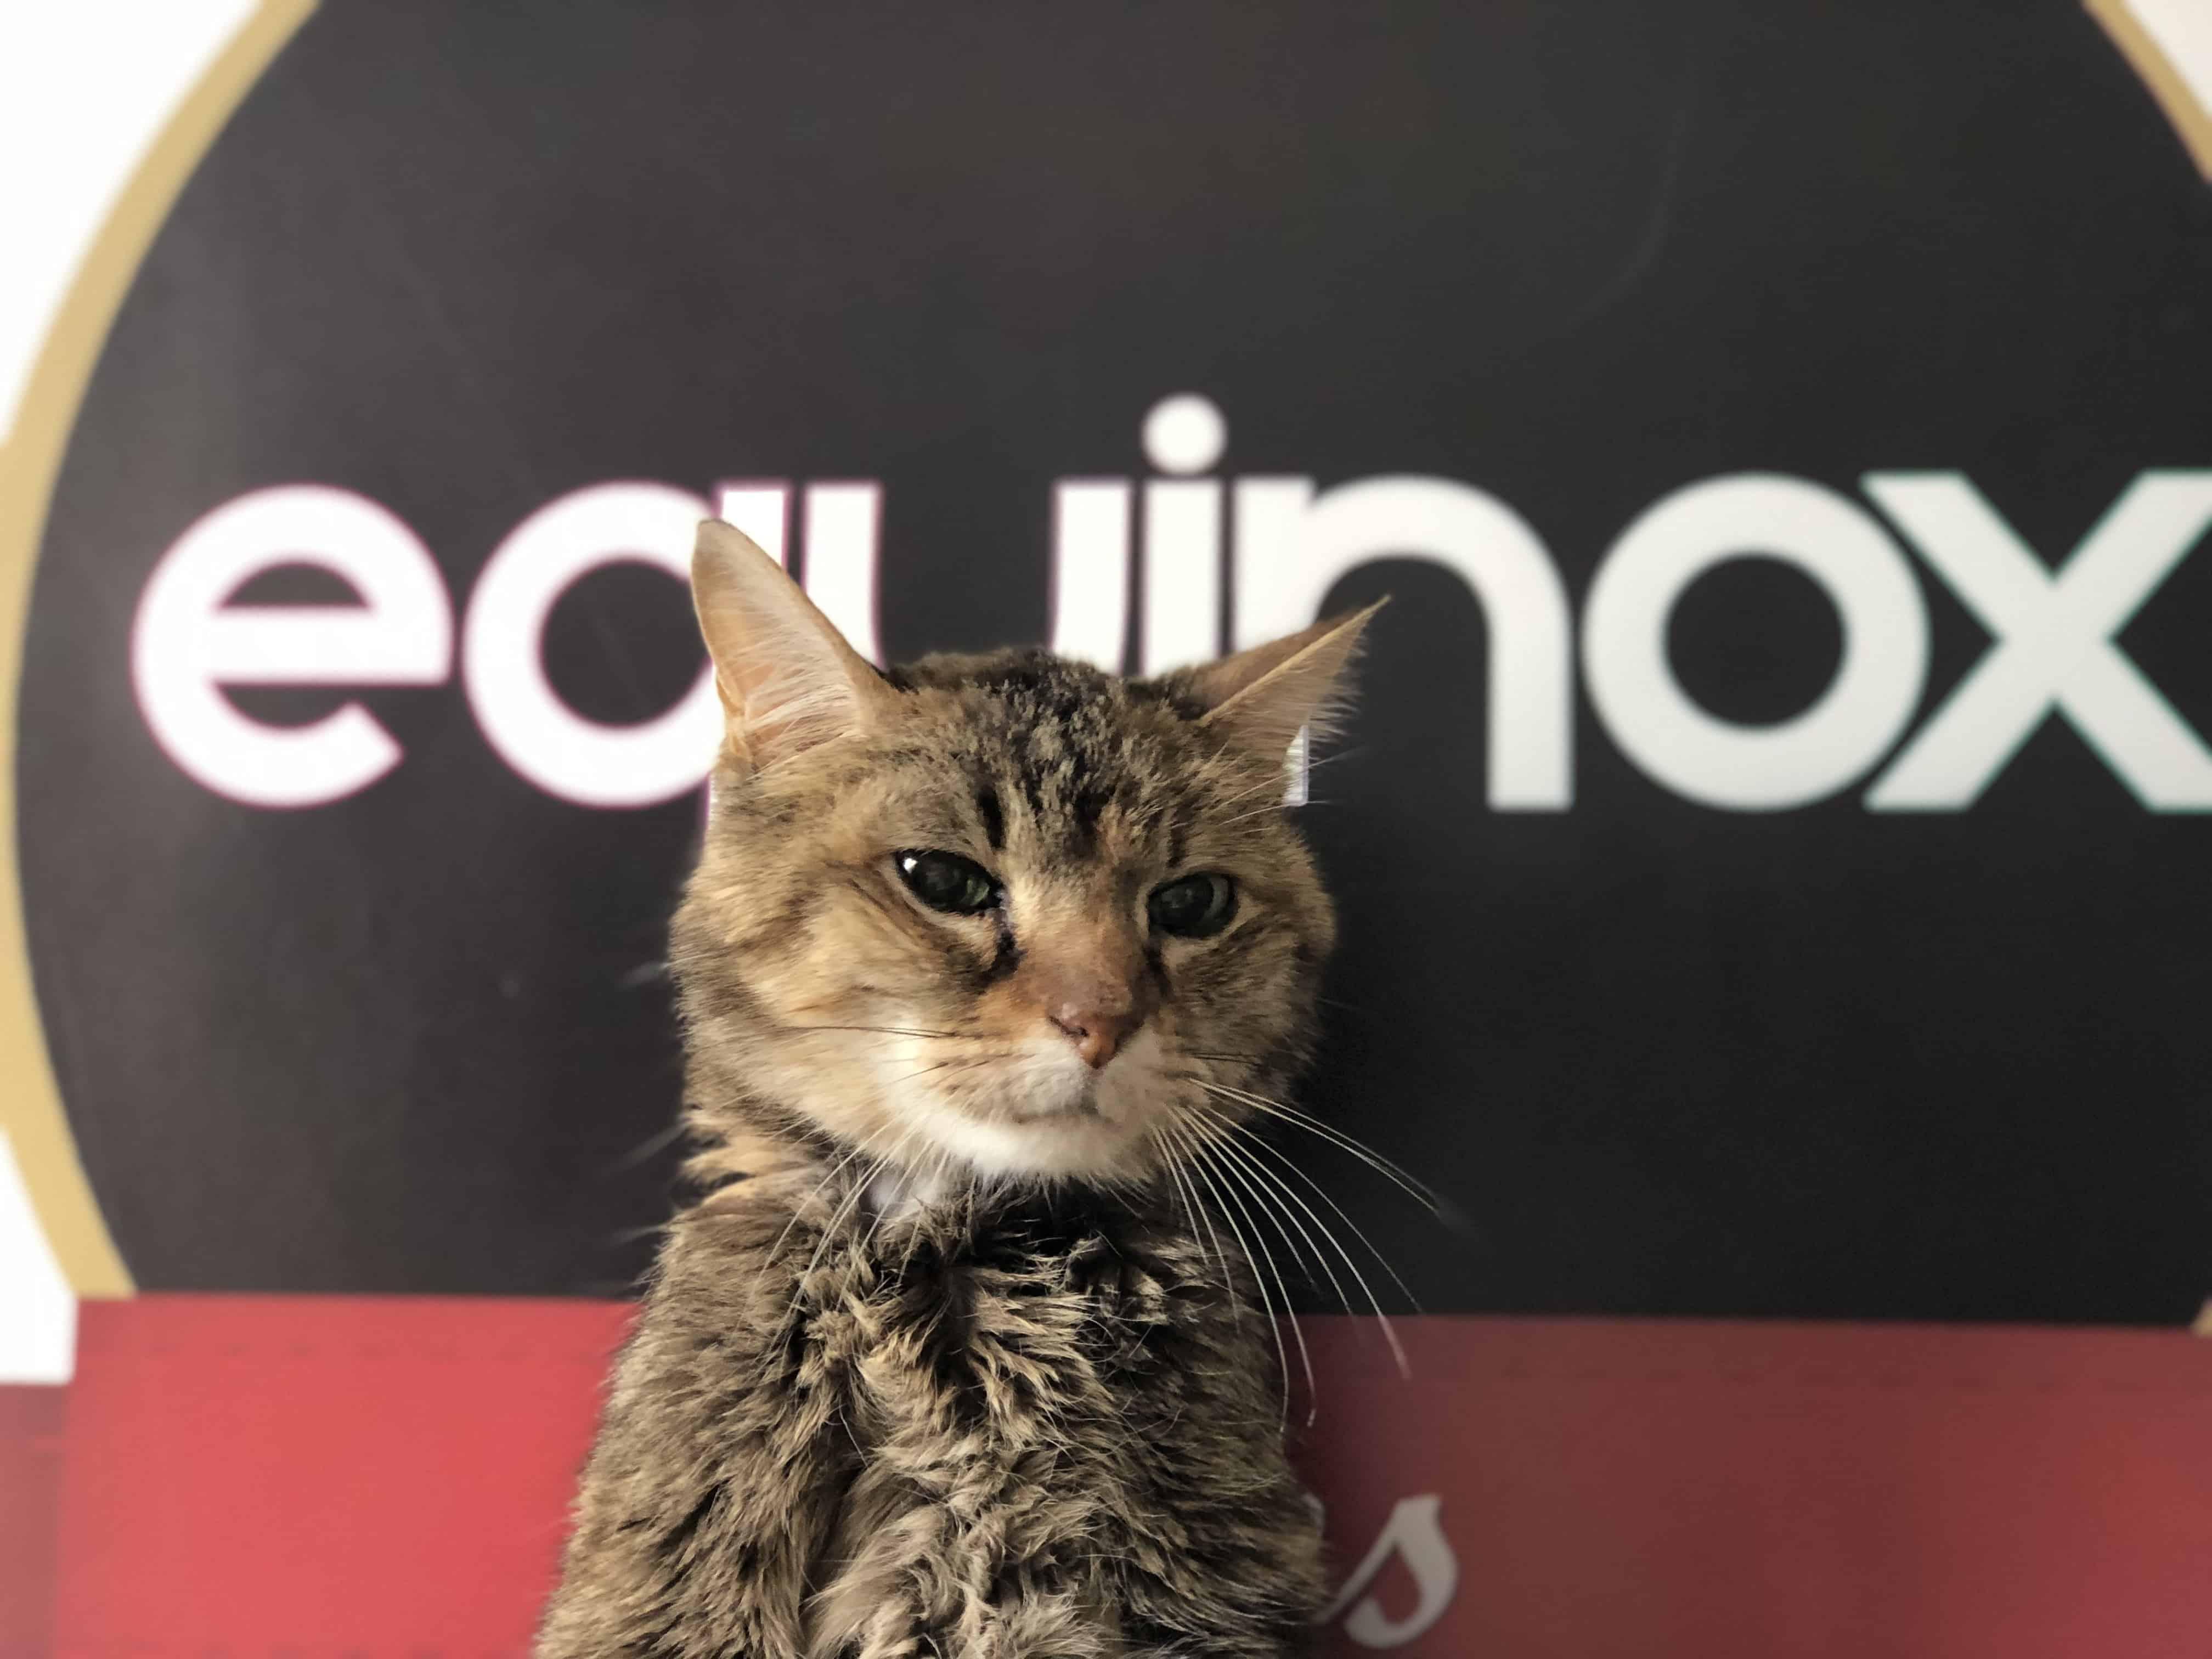 chat-equinox